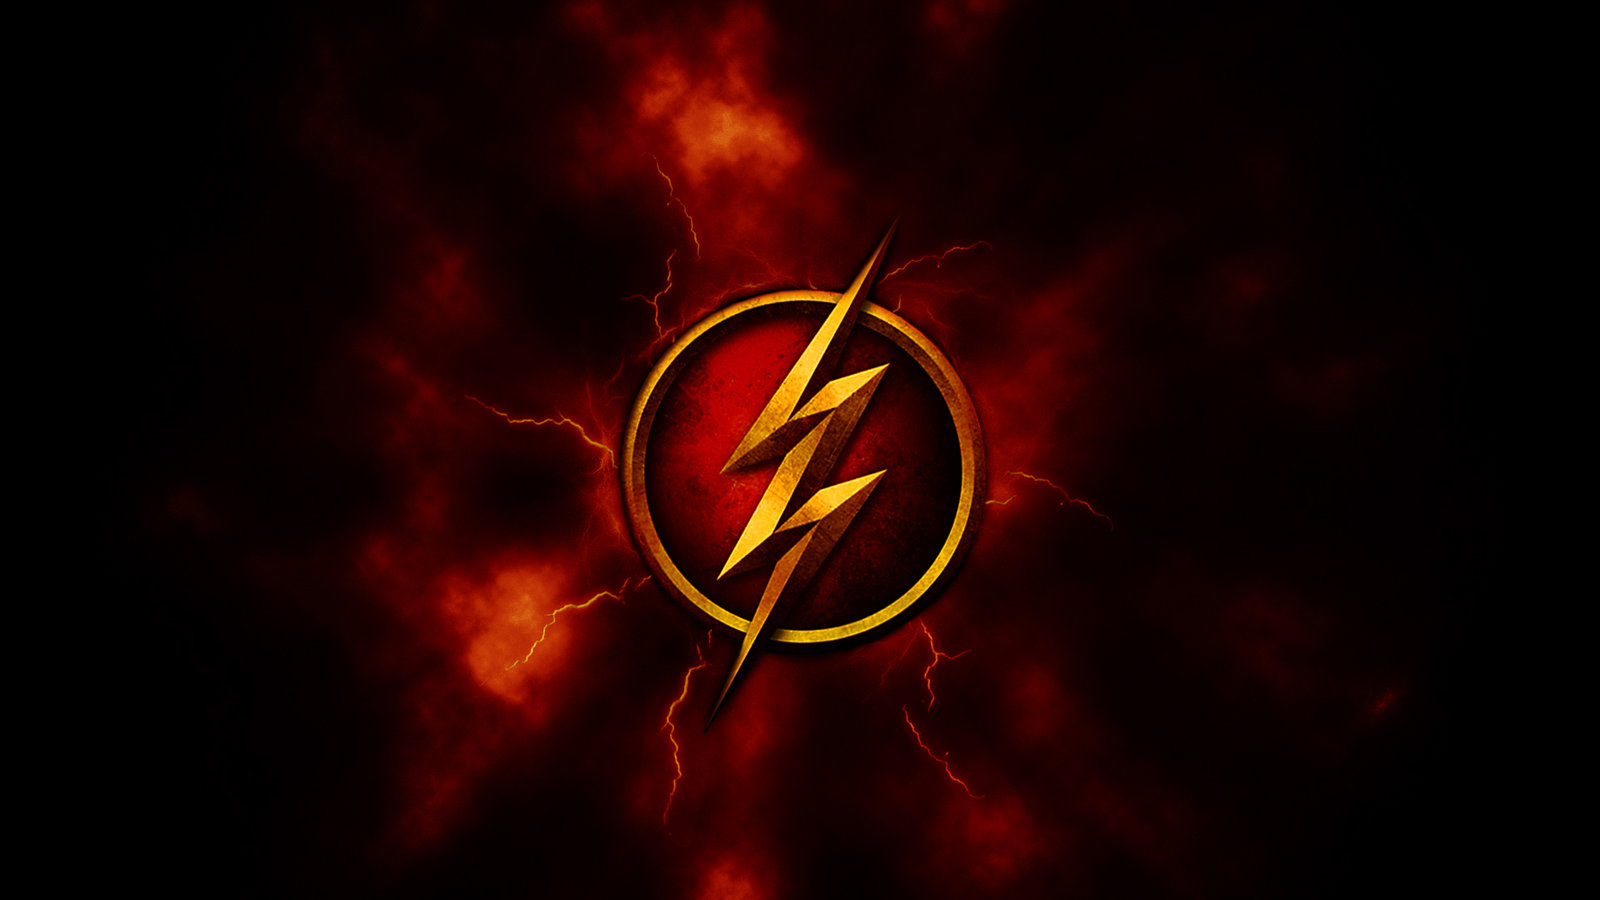 The Flash Logo Wallpaper Hd image gallery 1600x900